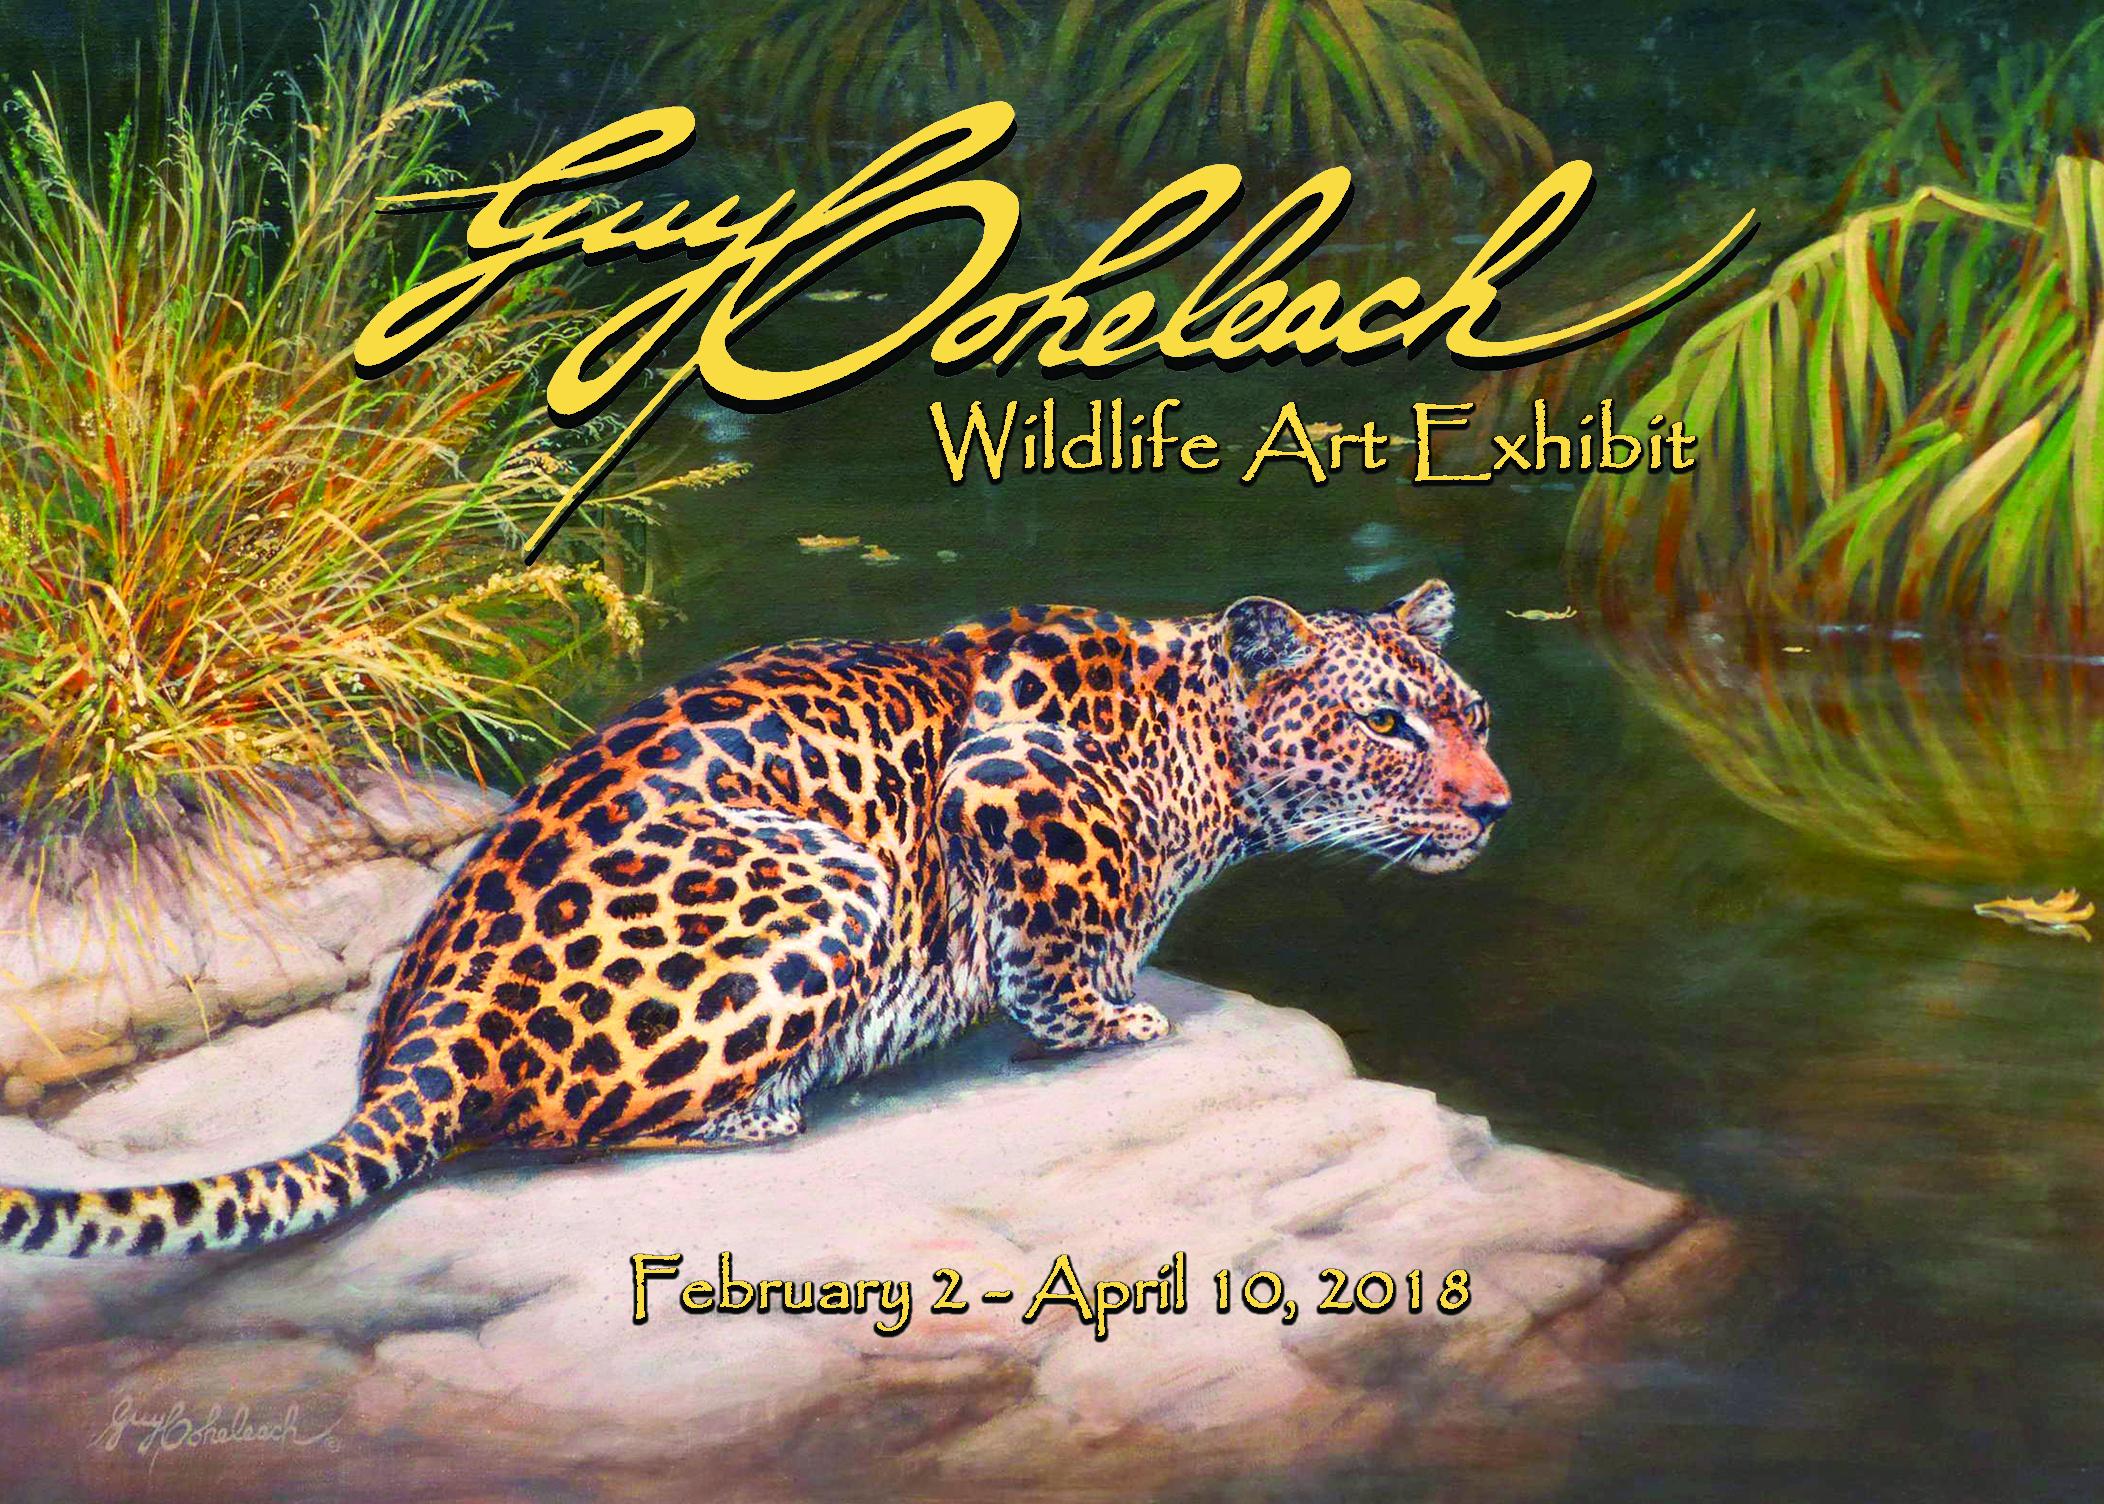 Guy Coheleach Wildlife Art Exshibit